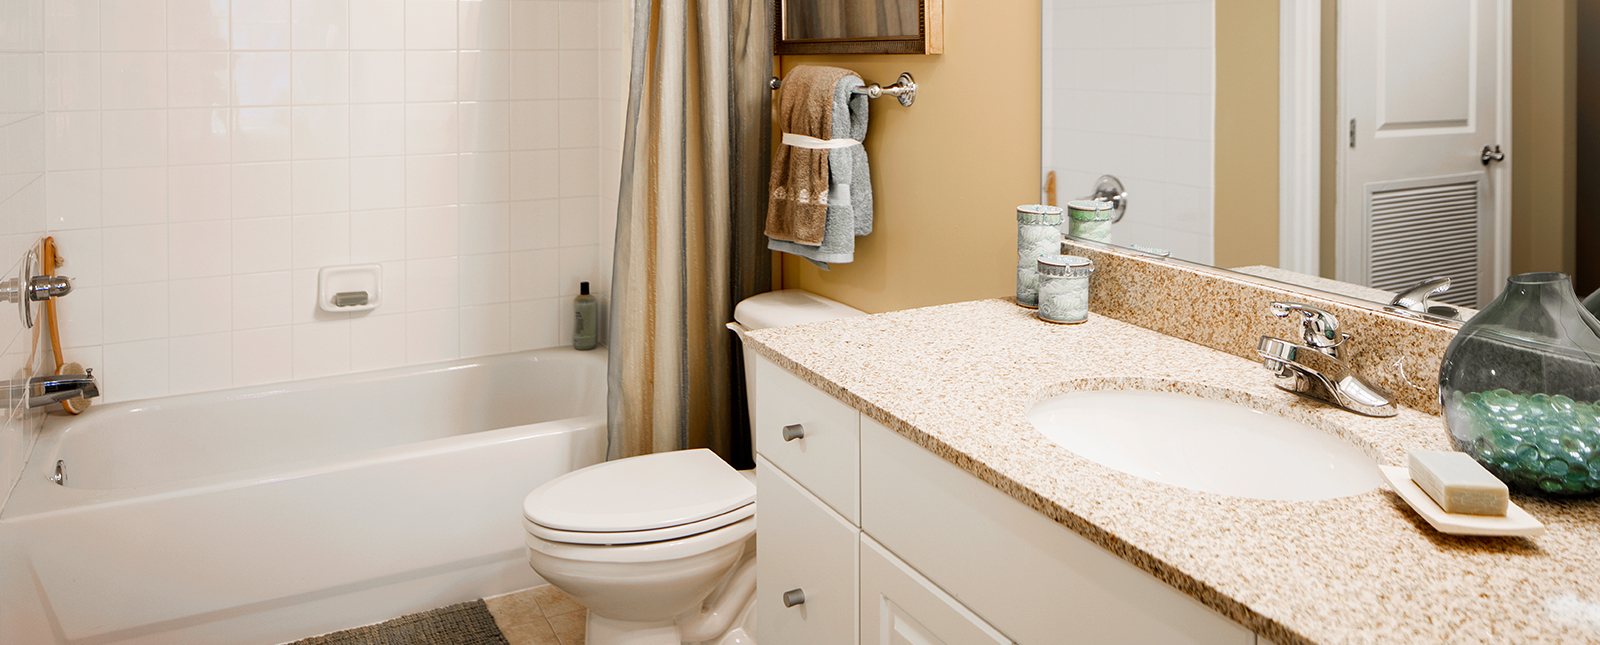 Bathroom at Spinnaker Bay Serviced Apartments